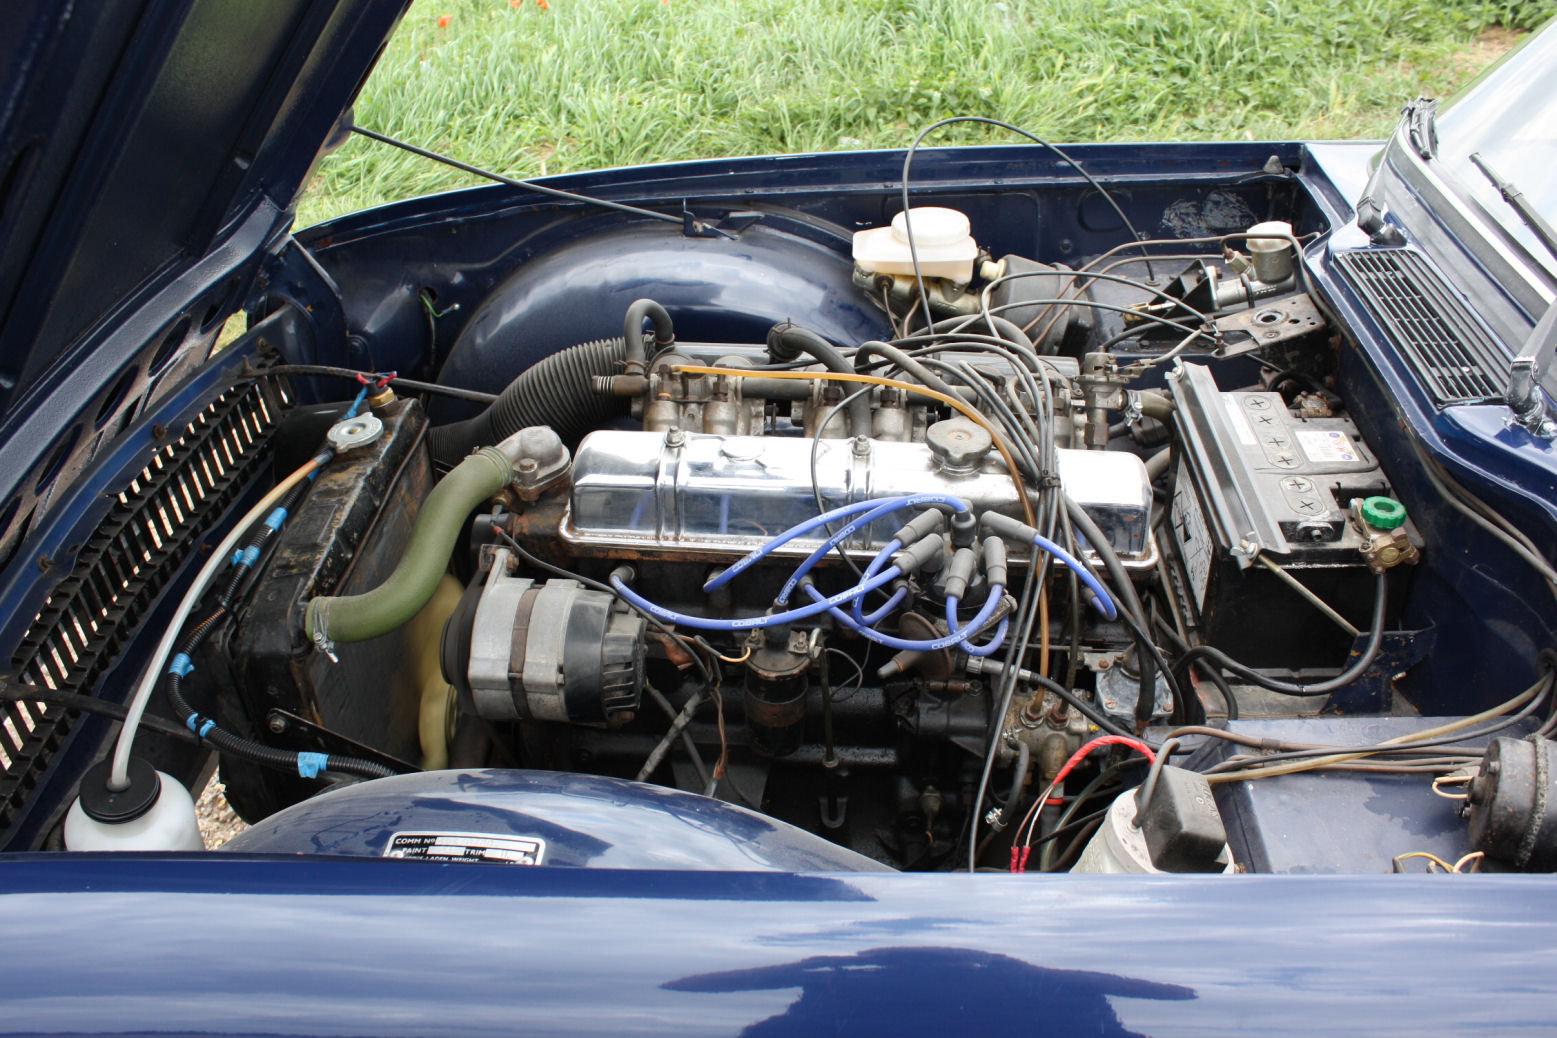 1972 TRIUMPH TR6 ORIGINAL 150BHP UK CAR IN BLUE SOLD (picture 3 of 6)